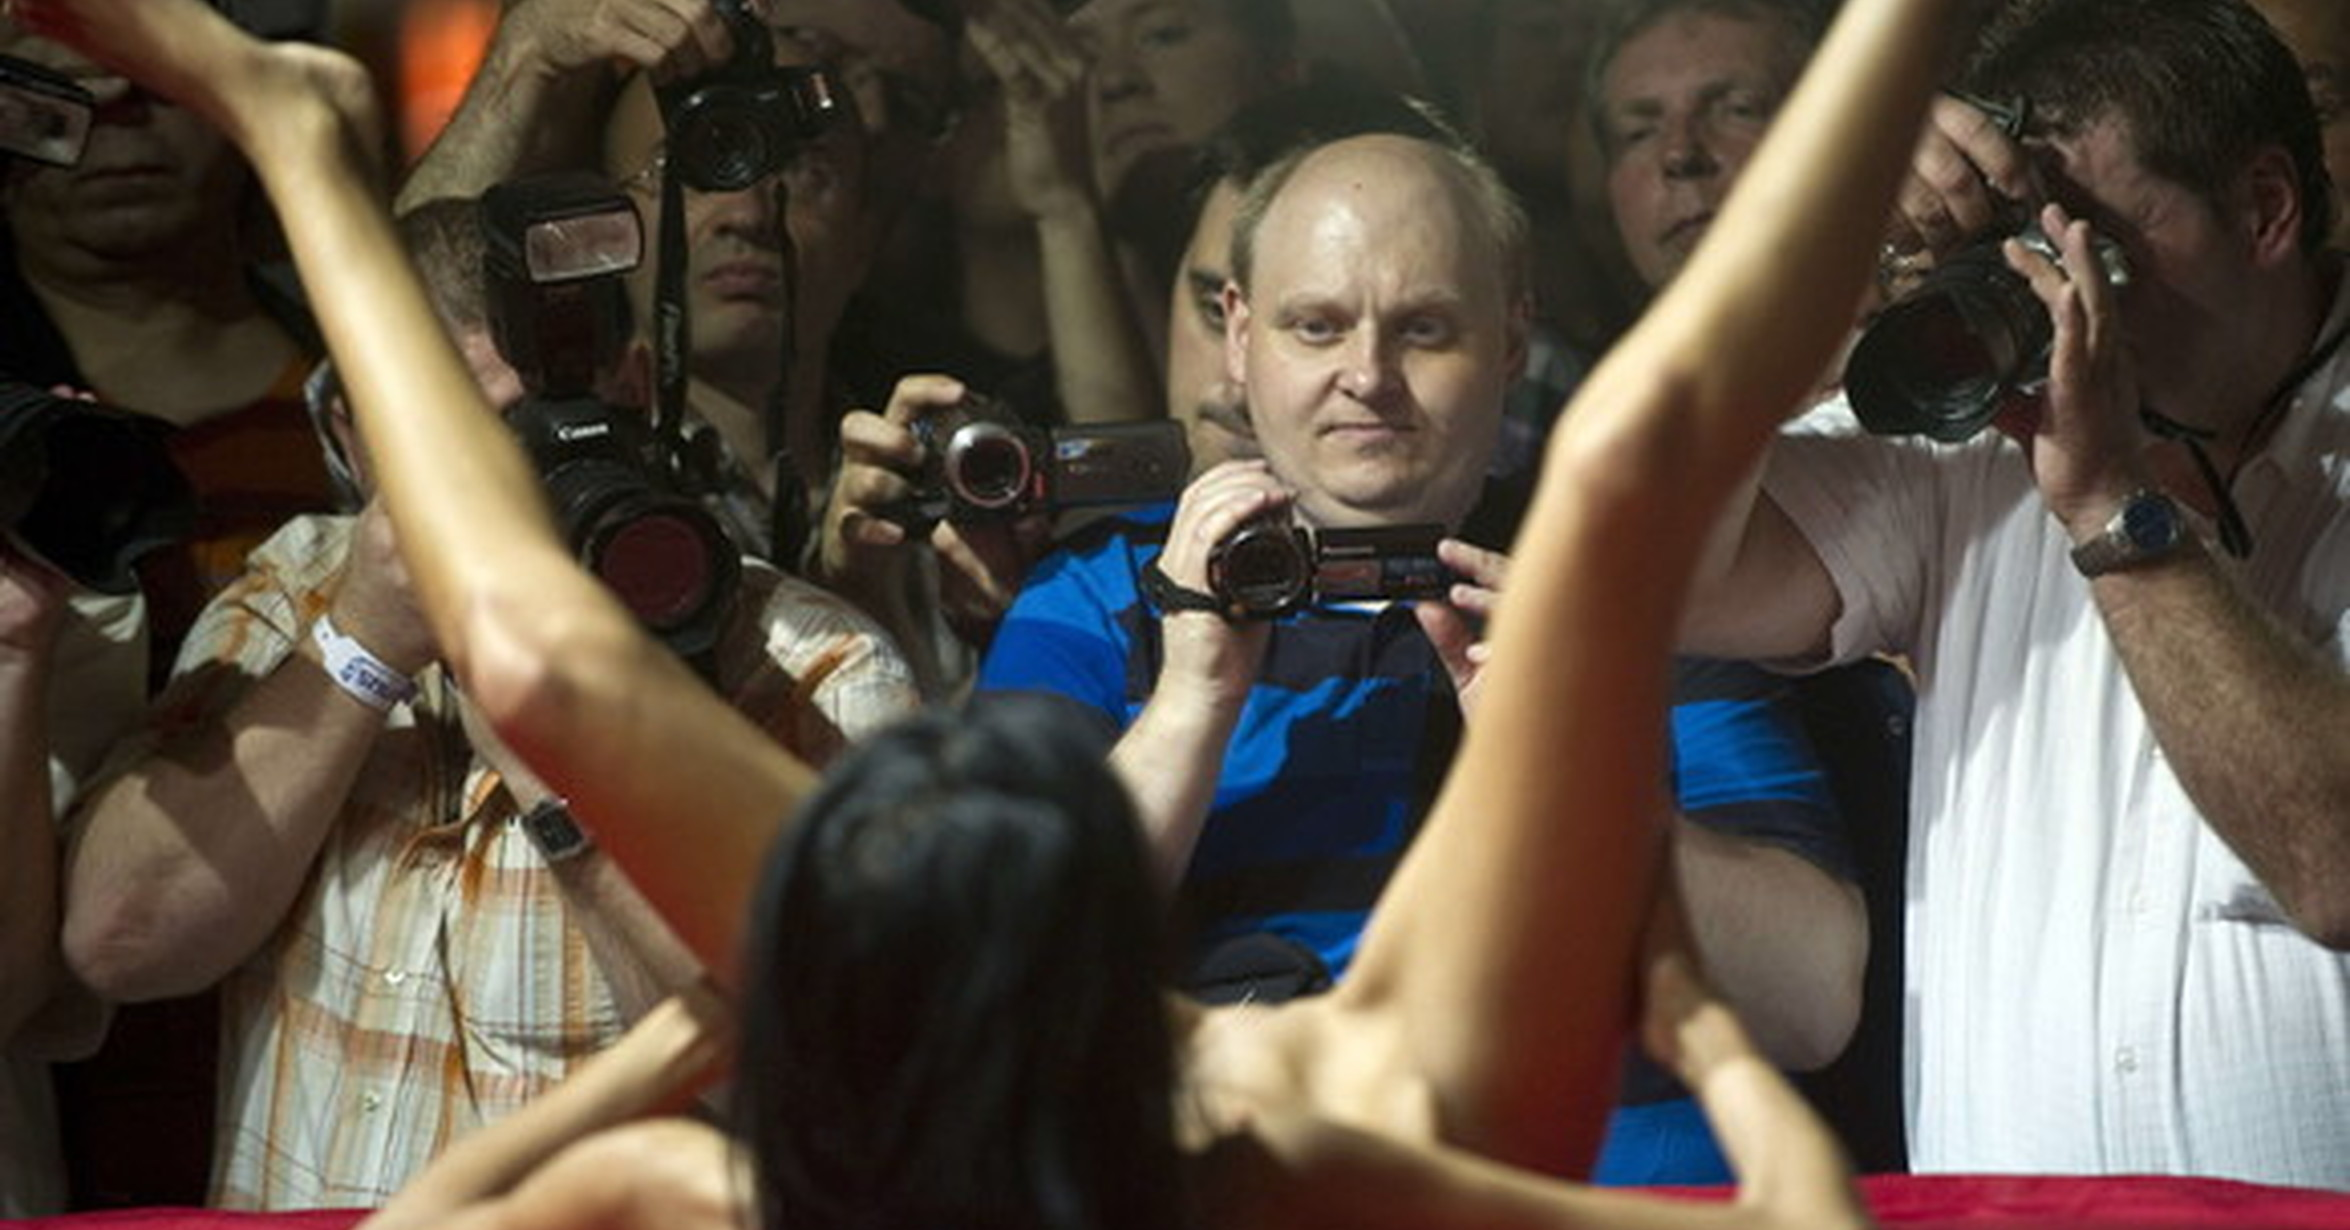 Rus azgın hatunun erotik filmi  rutubetinfo